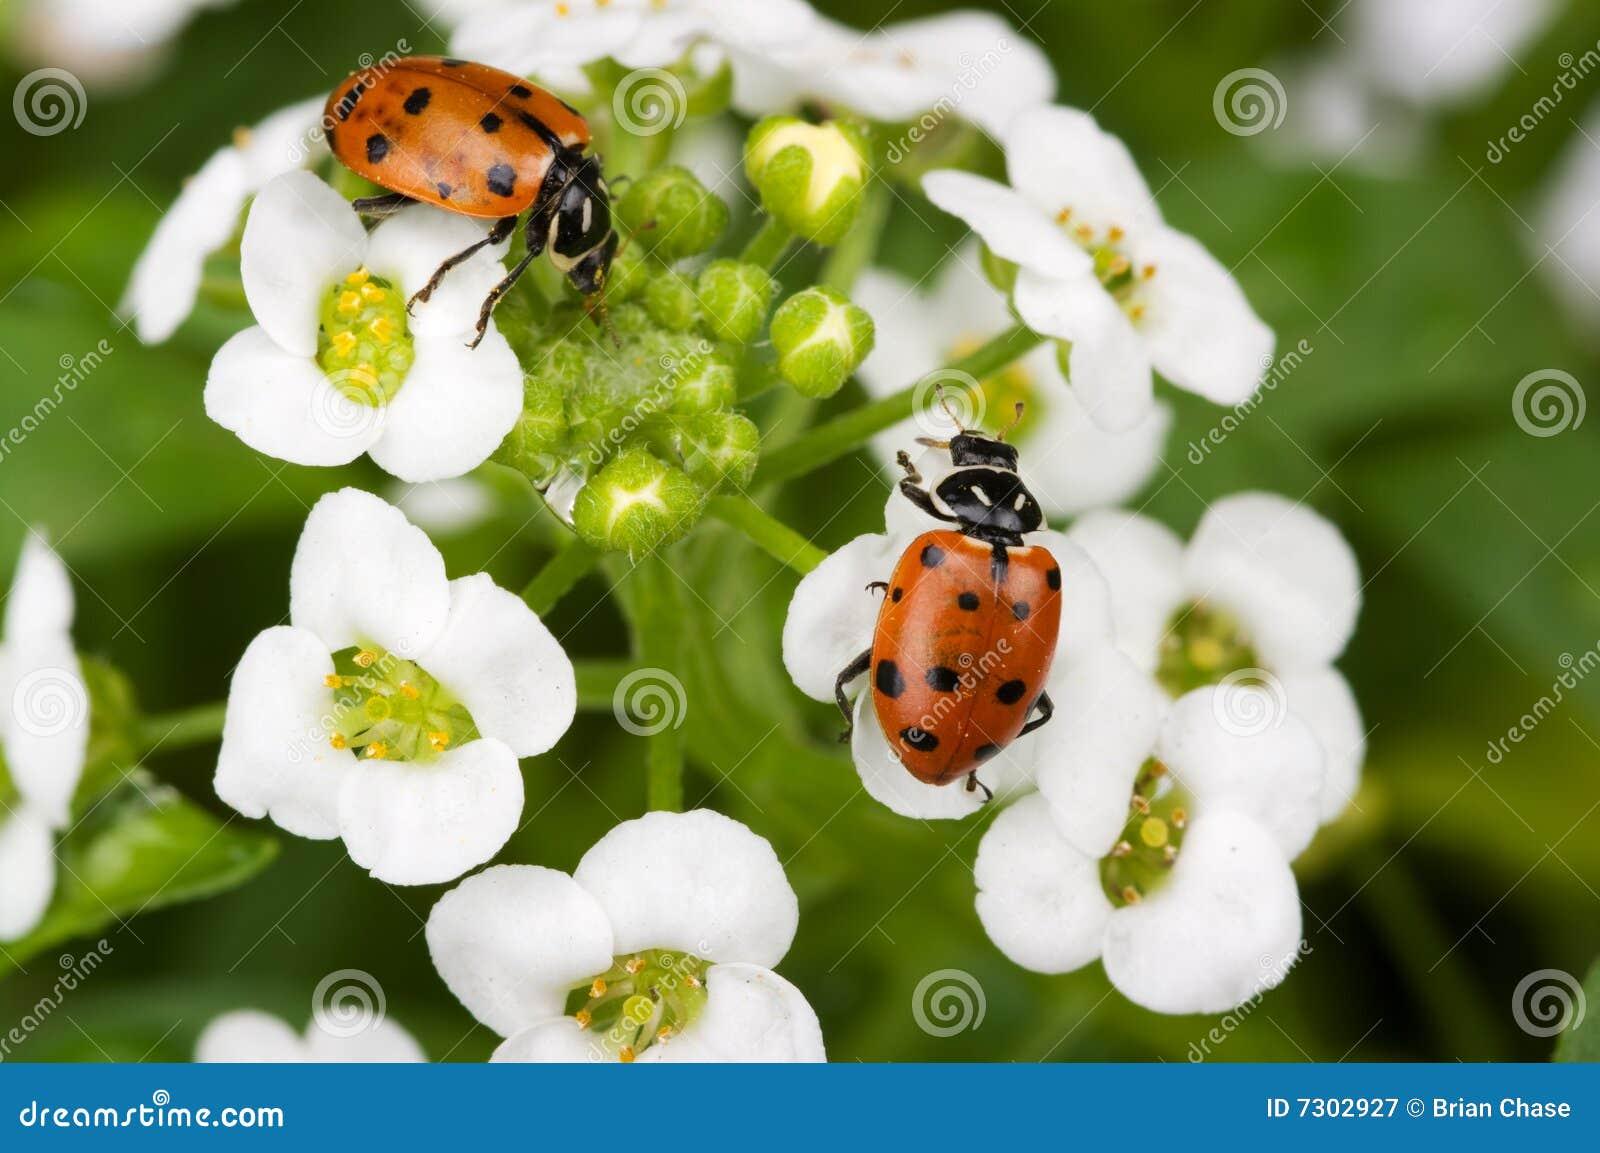 Signora Bugs